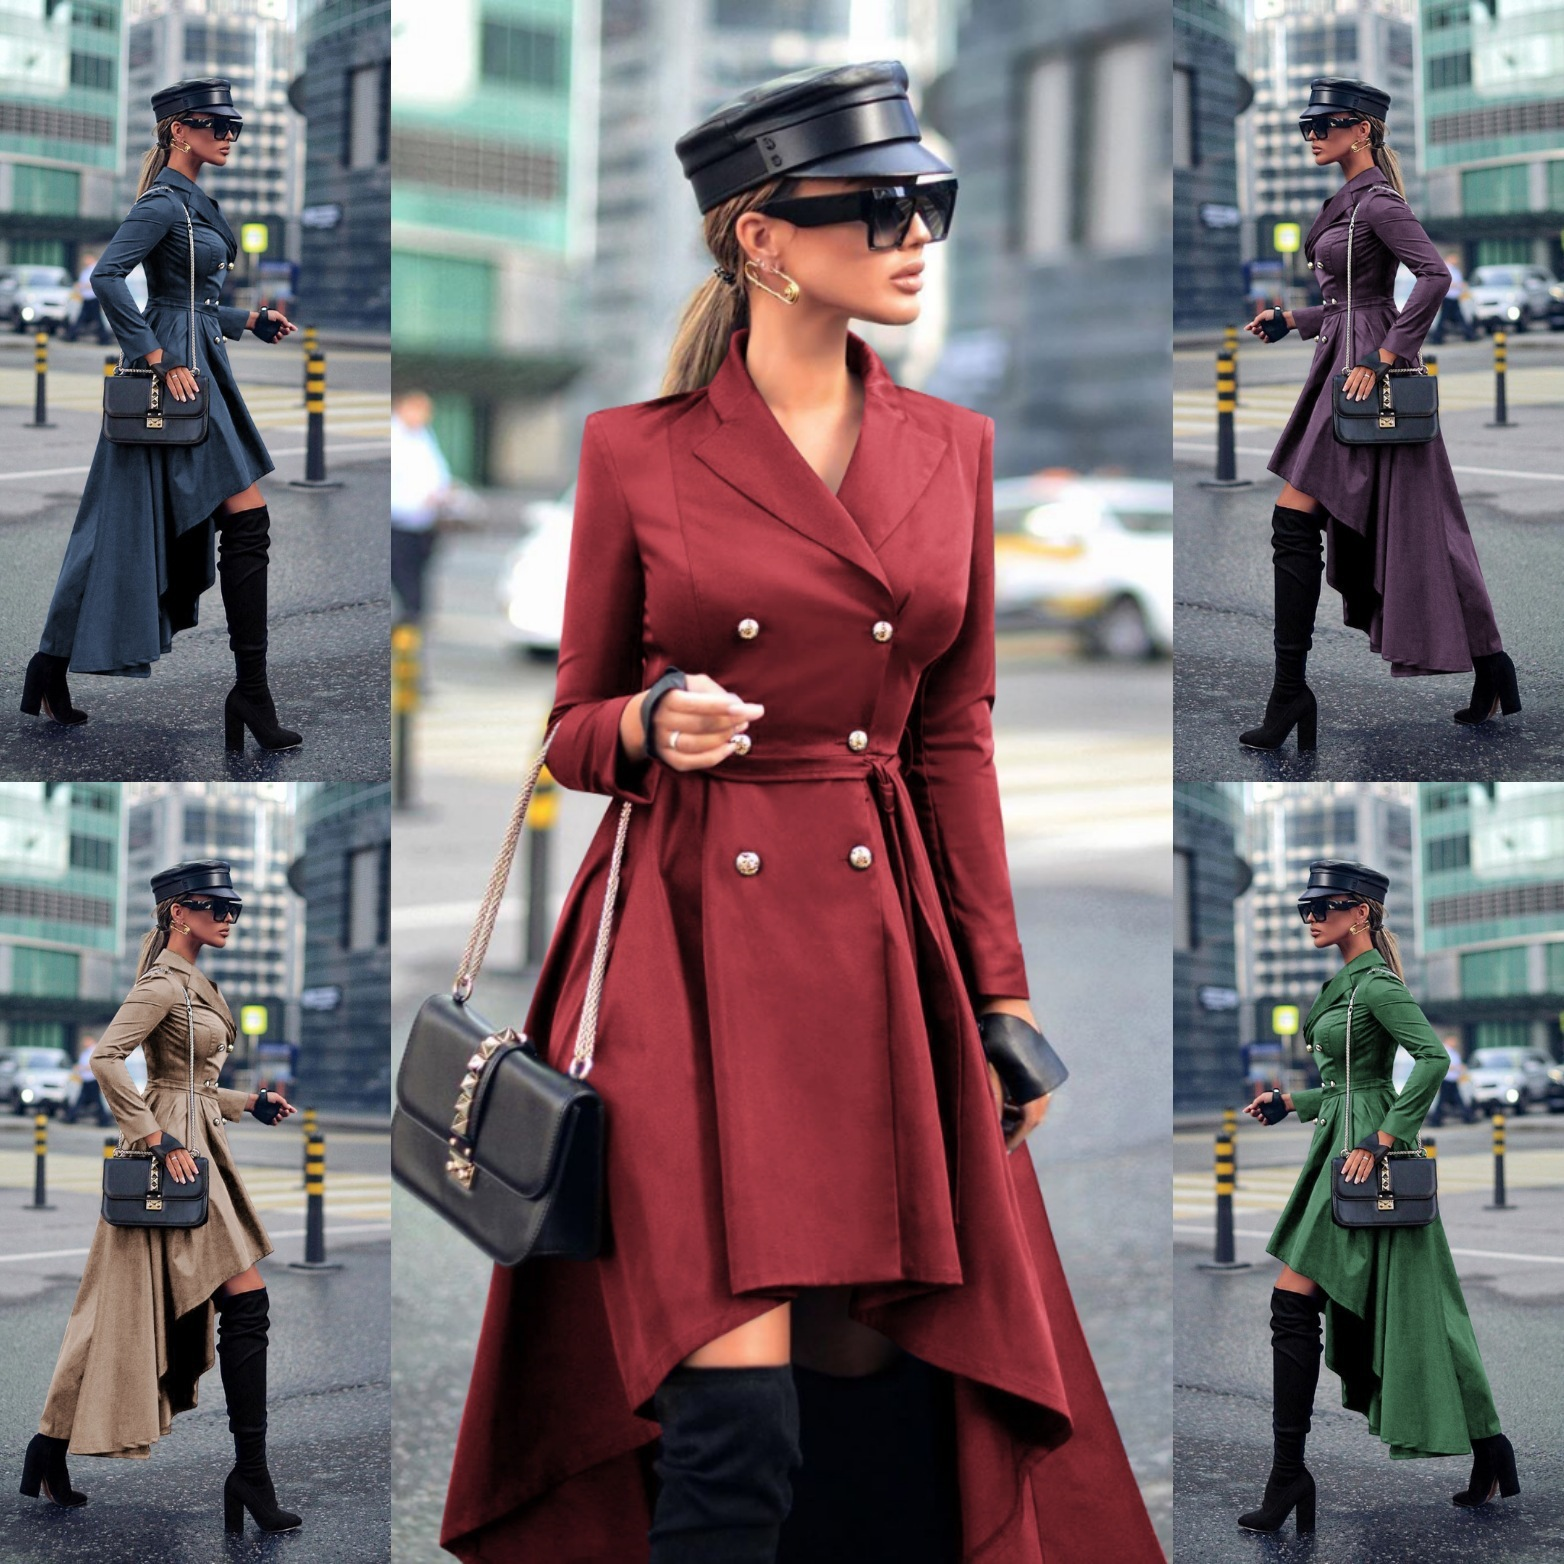 High Low Women Plus Size Dresses Solid Burgundy Khaki Double Breasted Suit Jacket Designer Ladies Blazer Dress Work Wear Tops